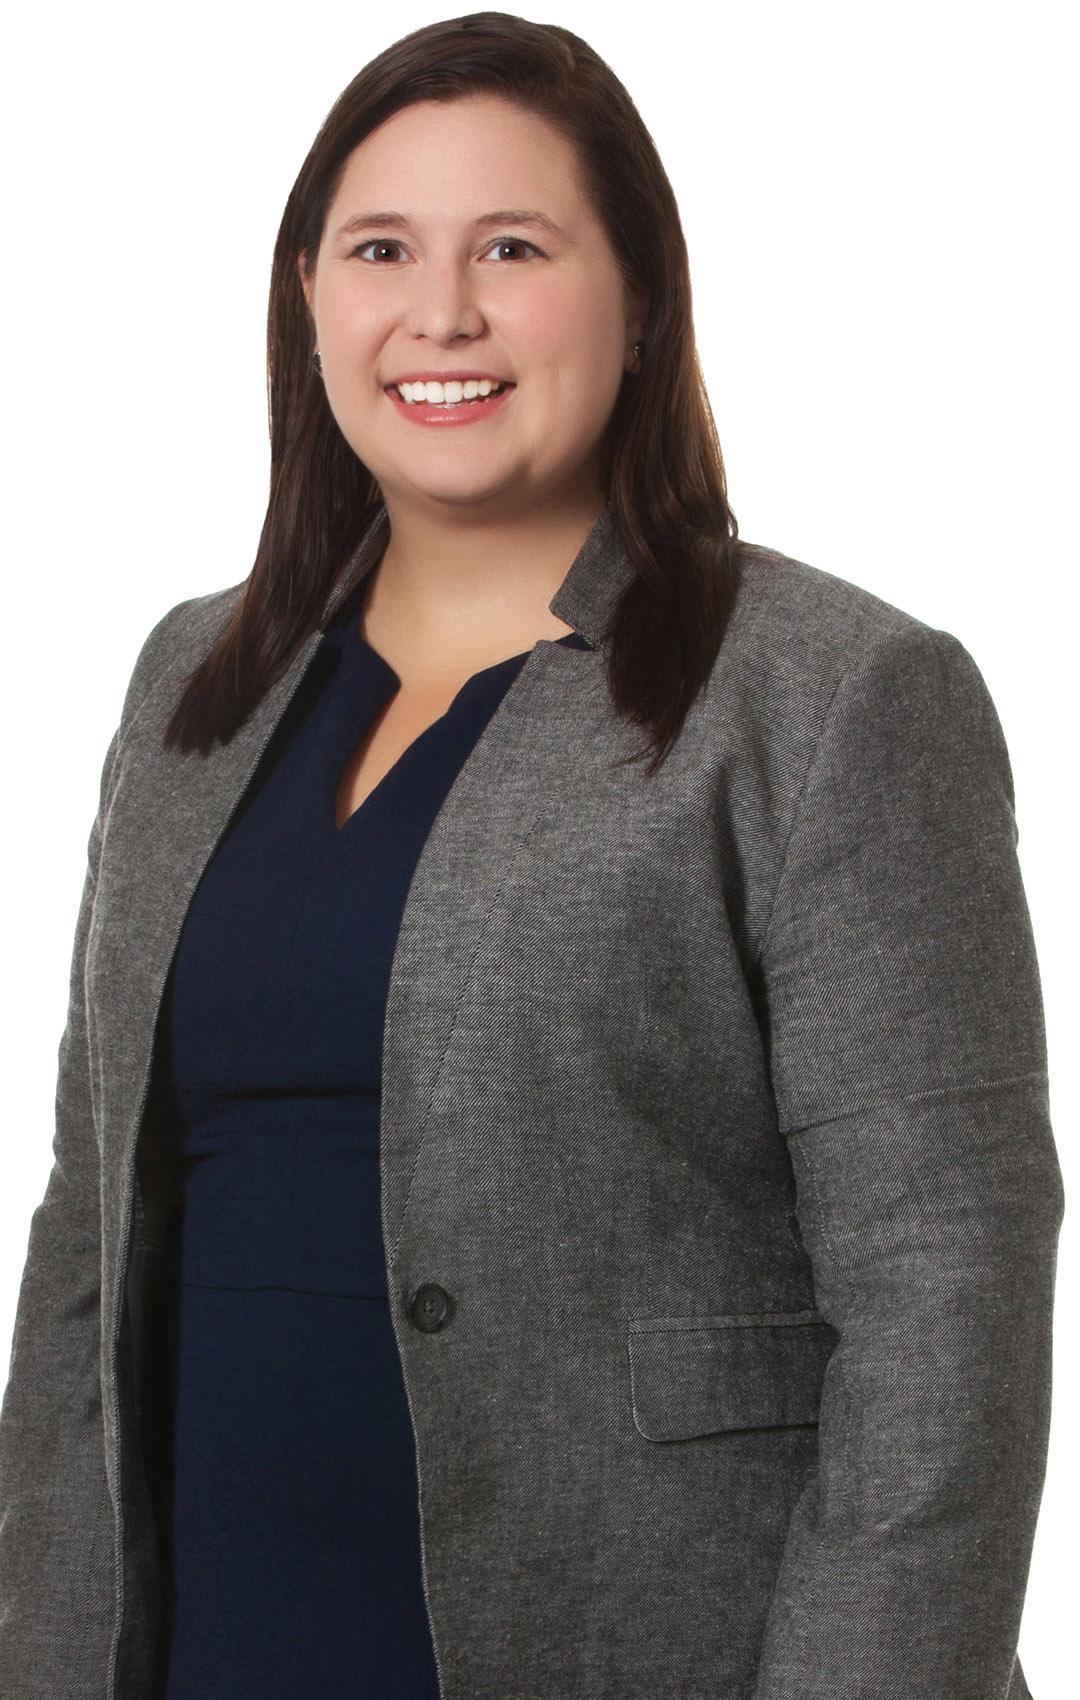 Alyssa Riggins